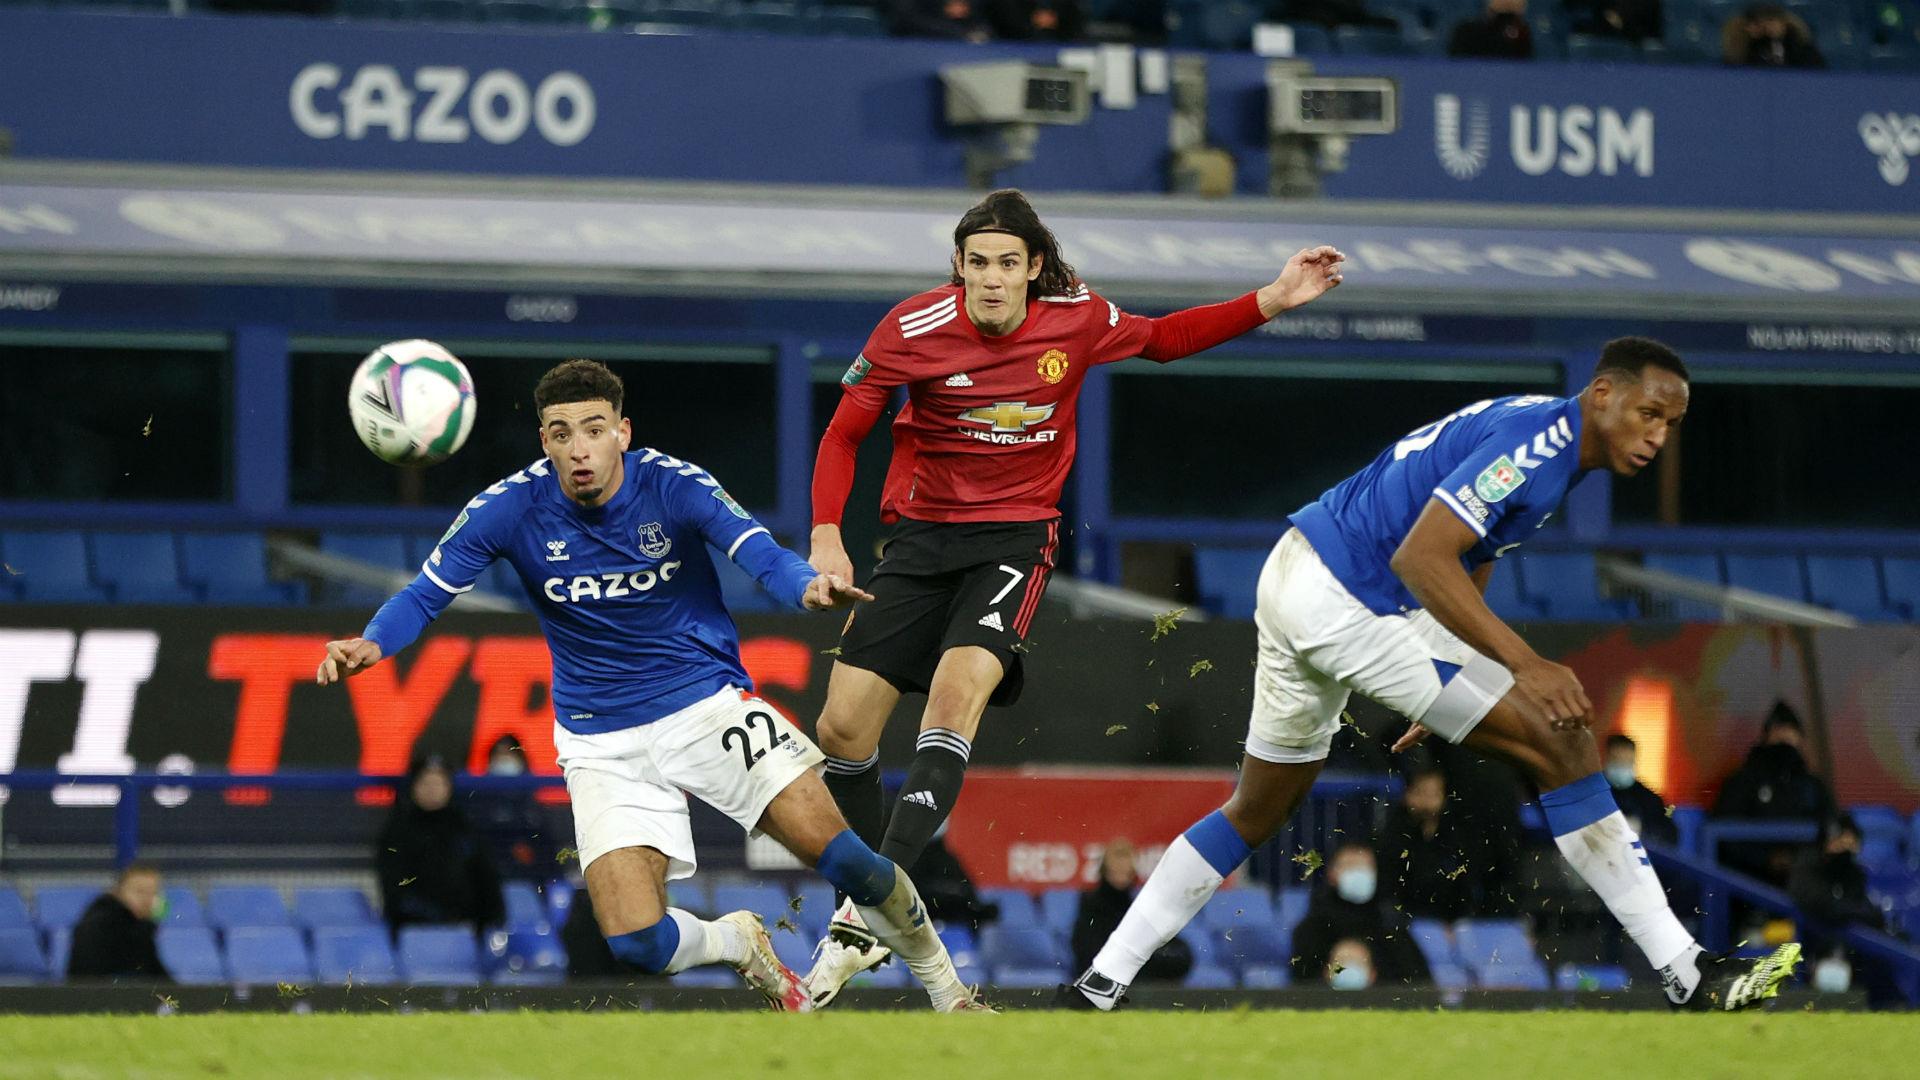 Everton 0-2 Manchester United: Cavani magic breaks Goodison hearts